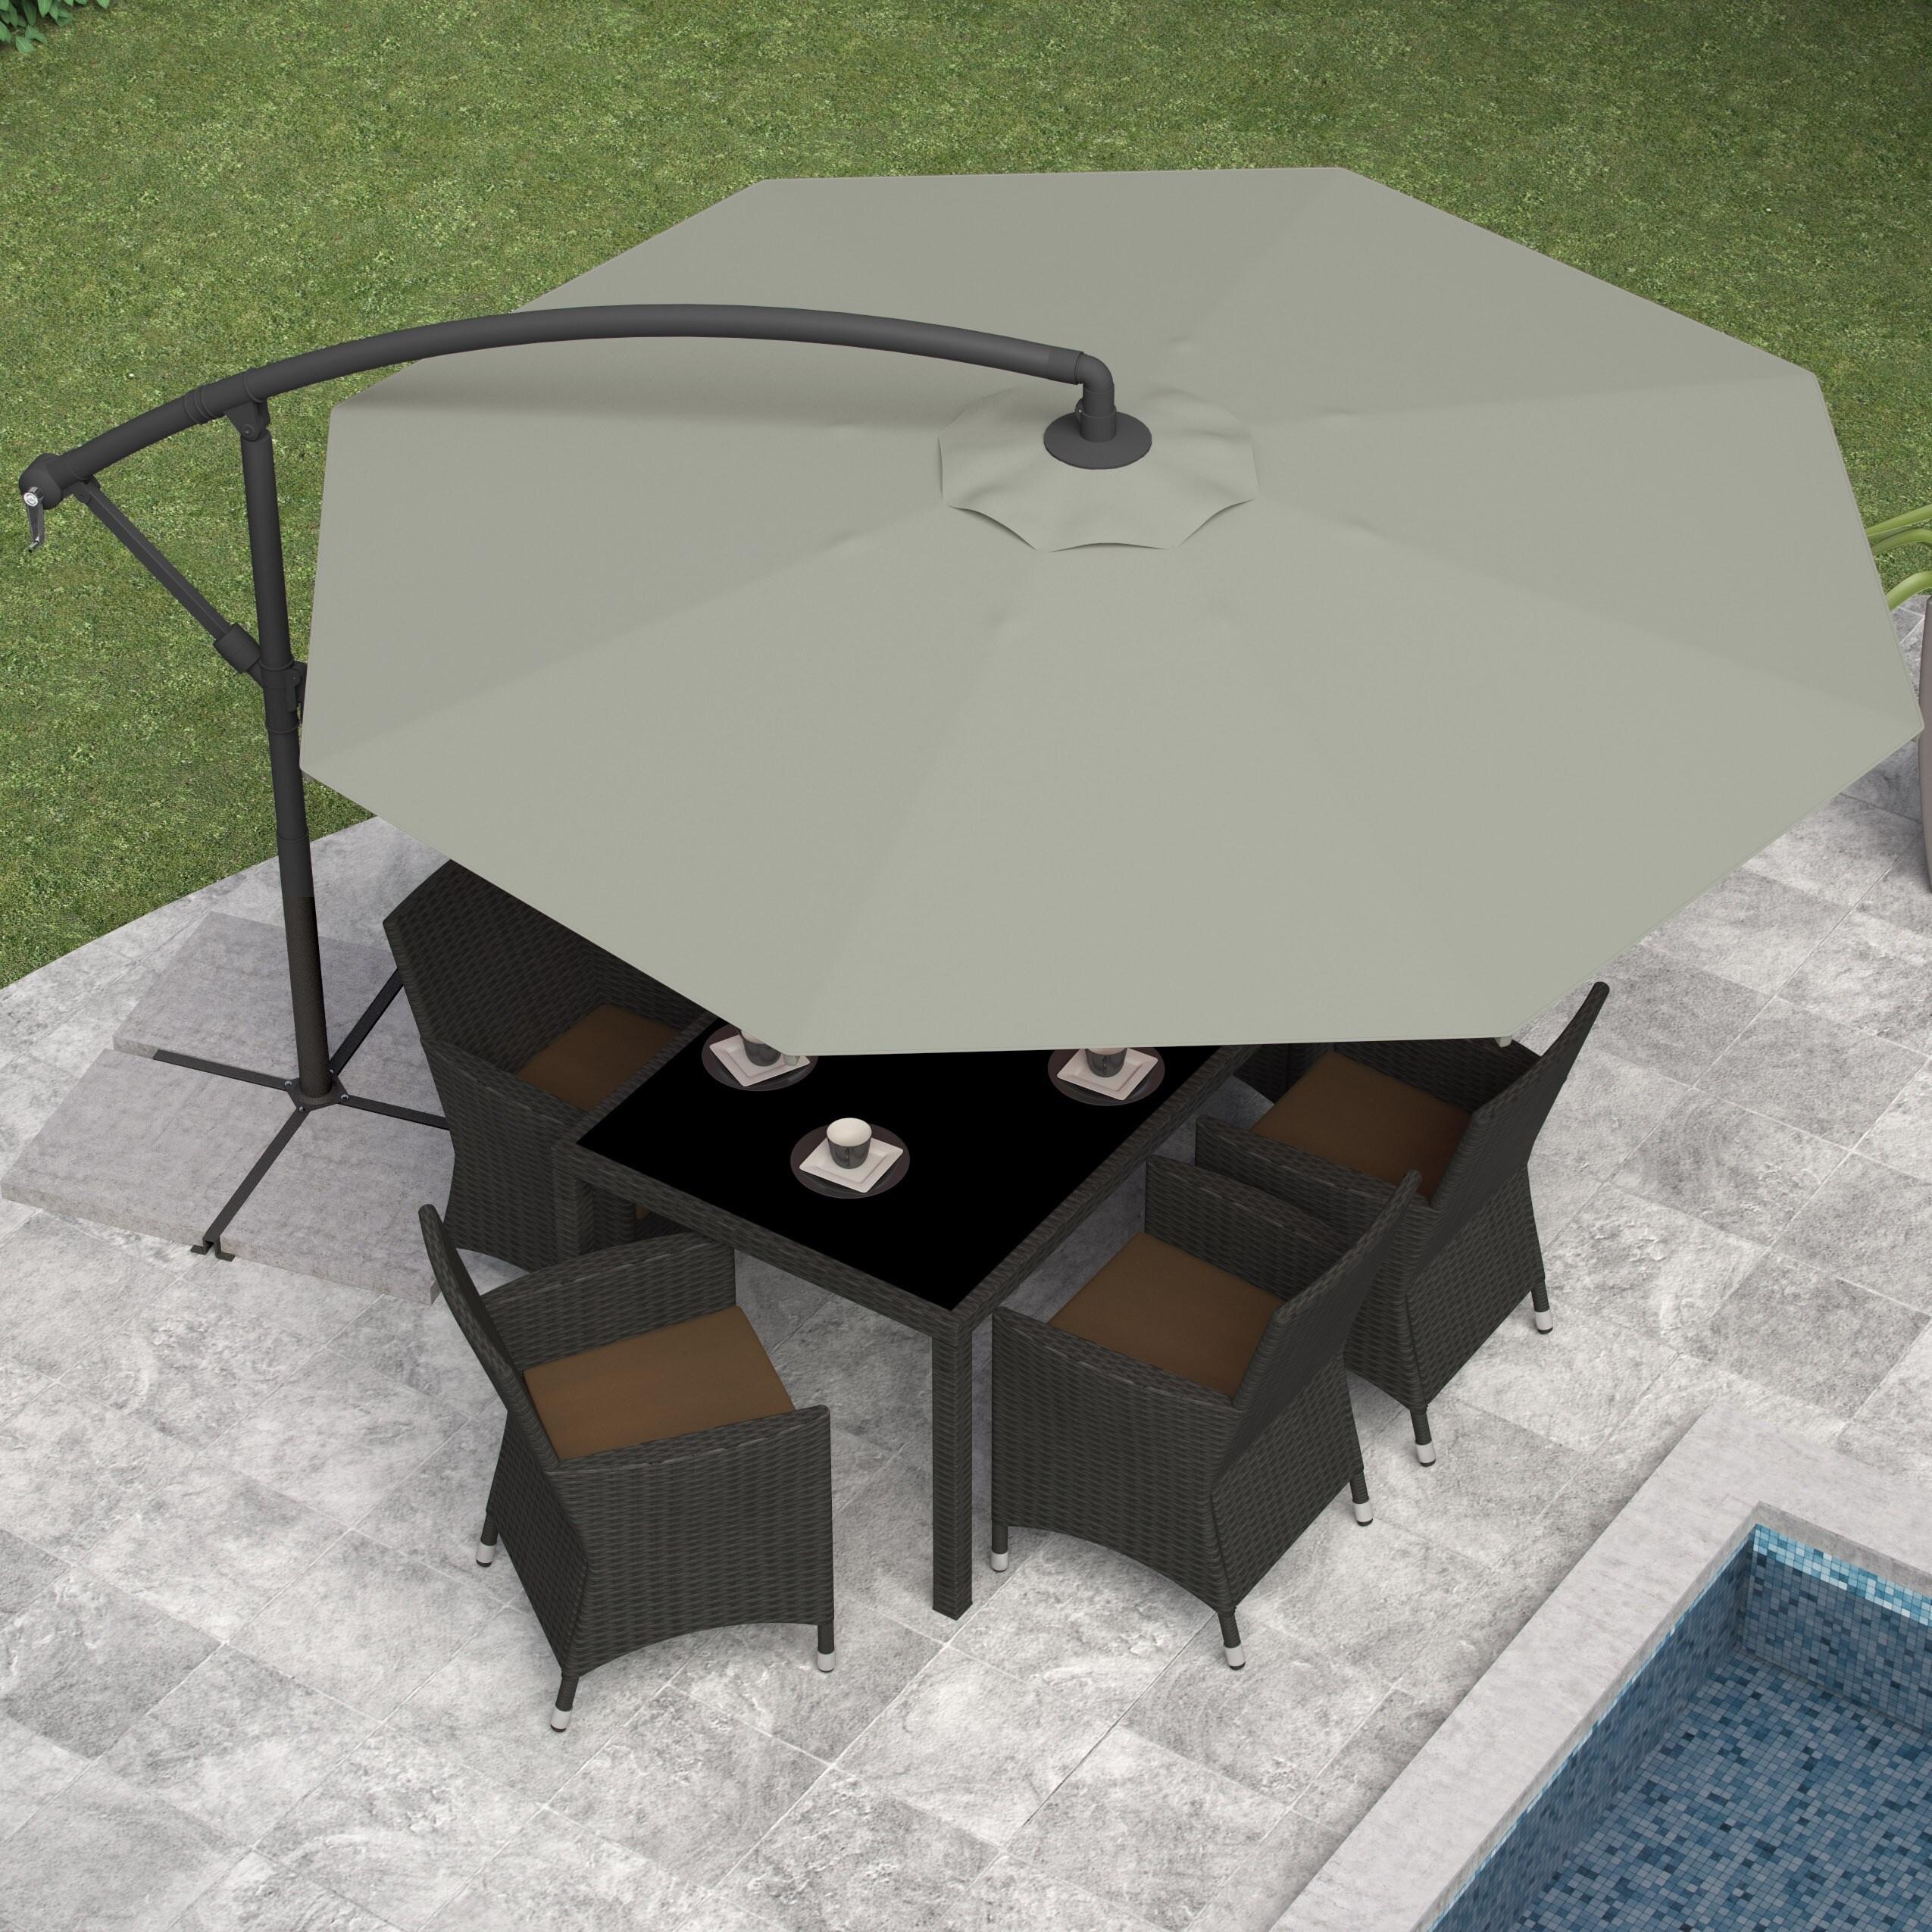 CorLiving fset Patio Umbrella Free Shipping Today Overstock